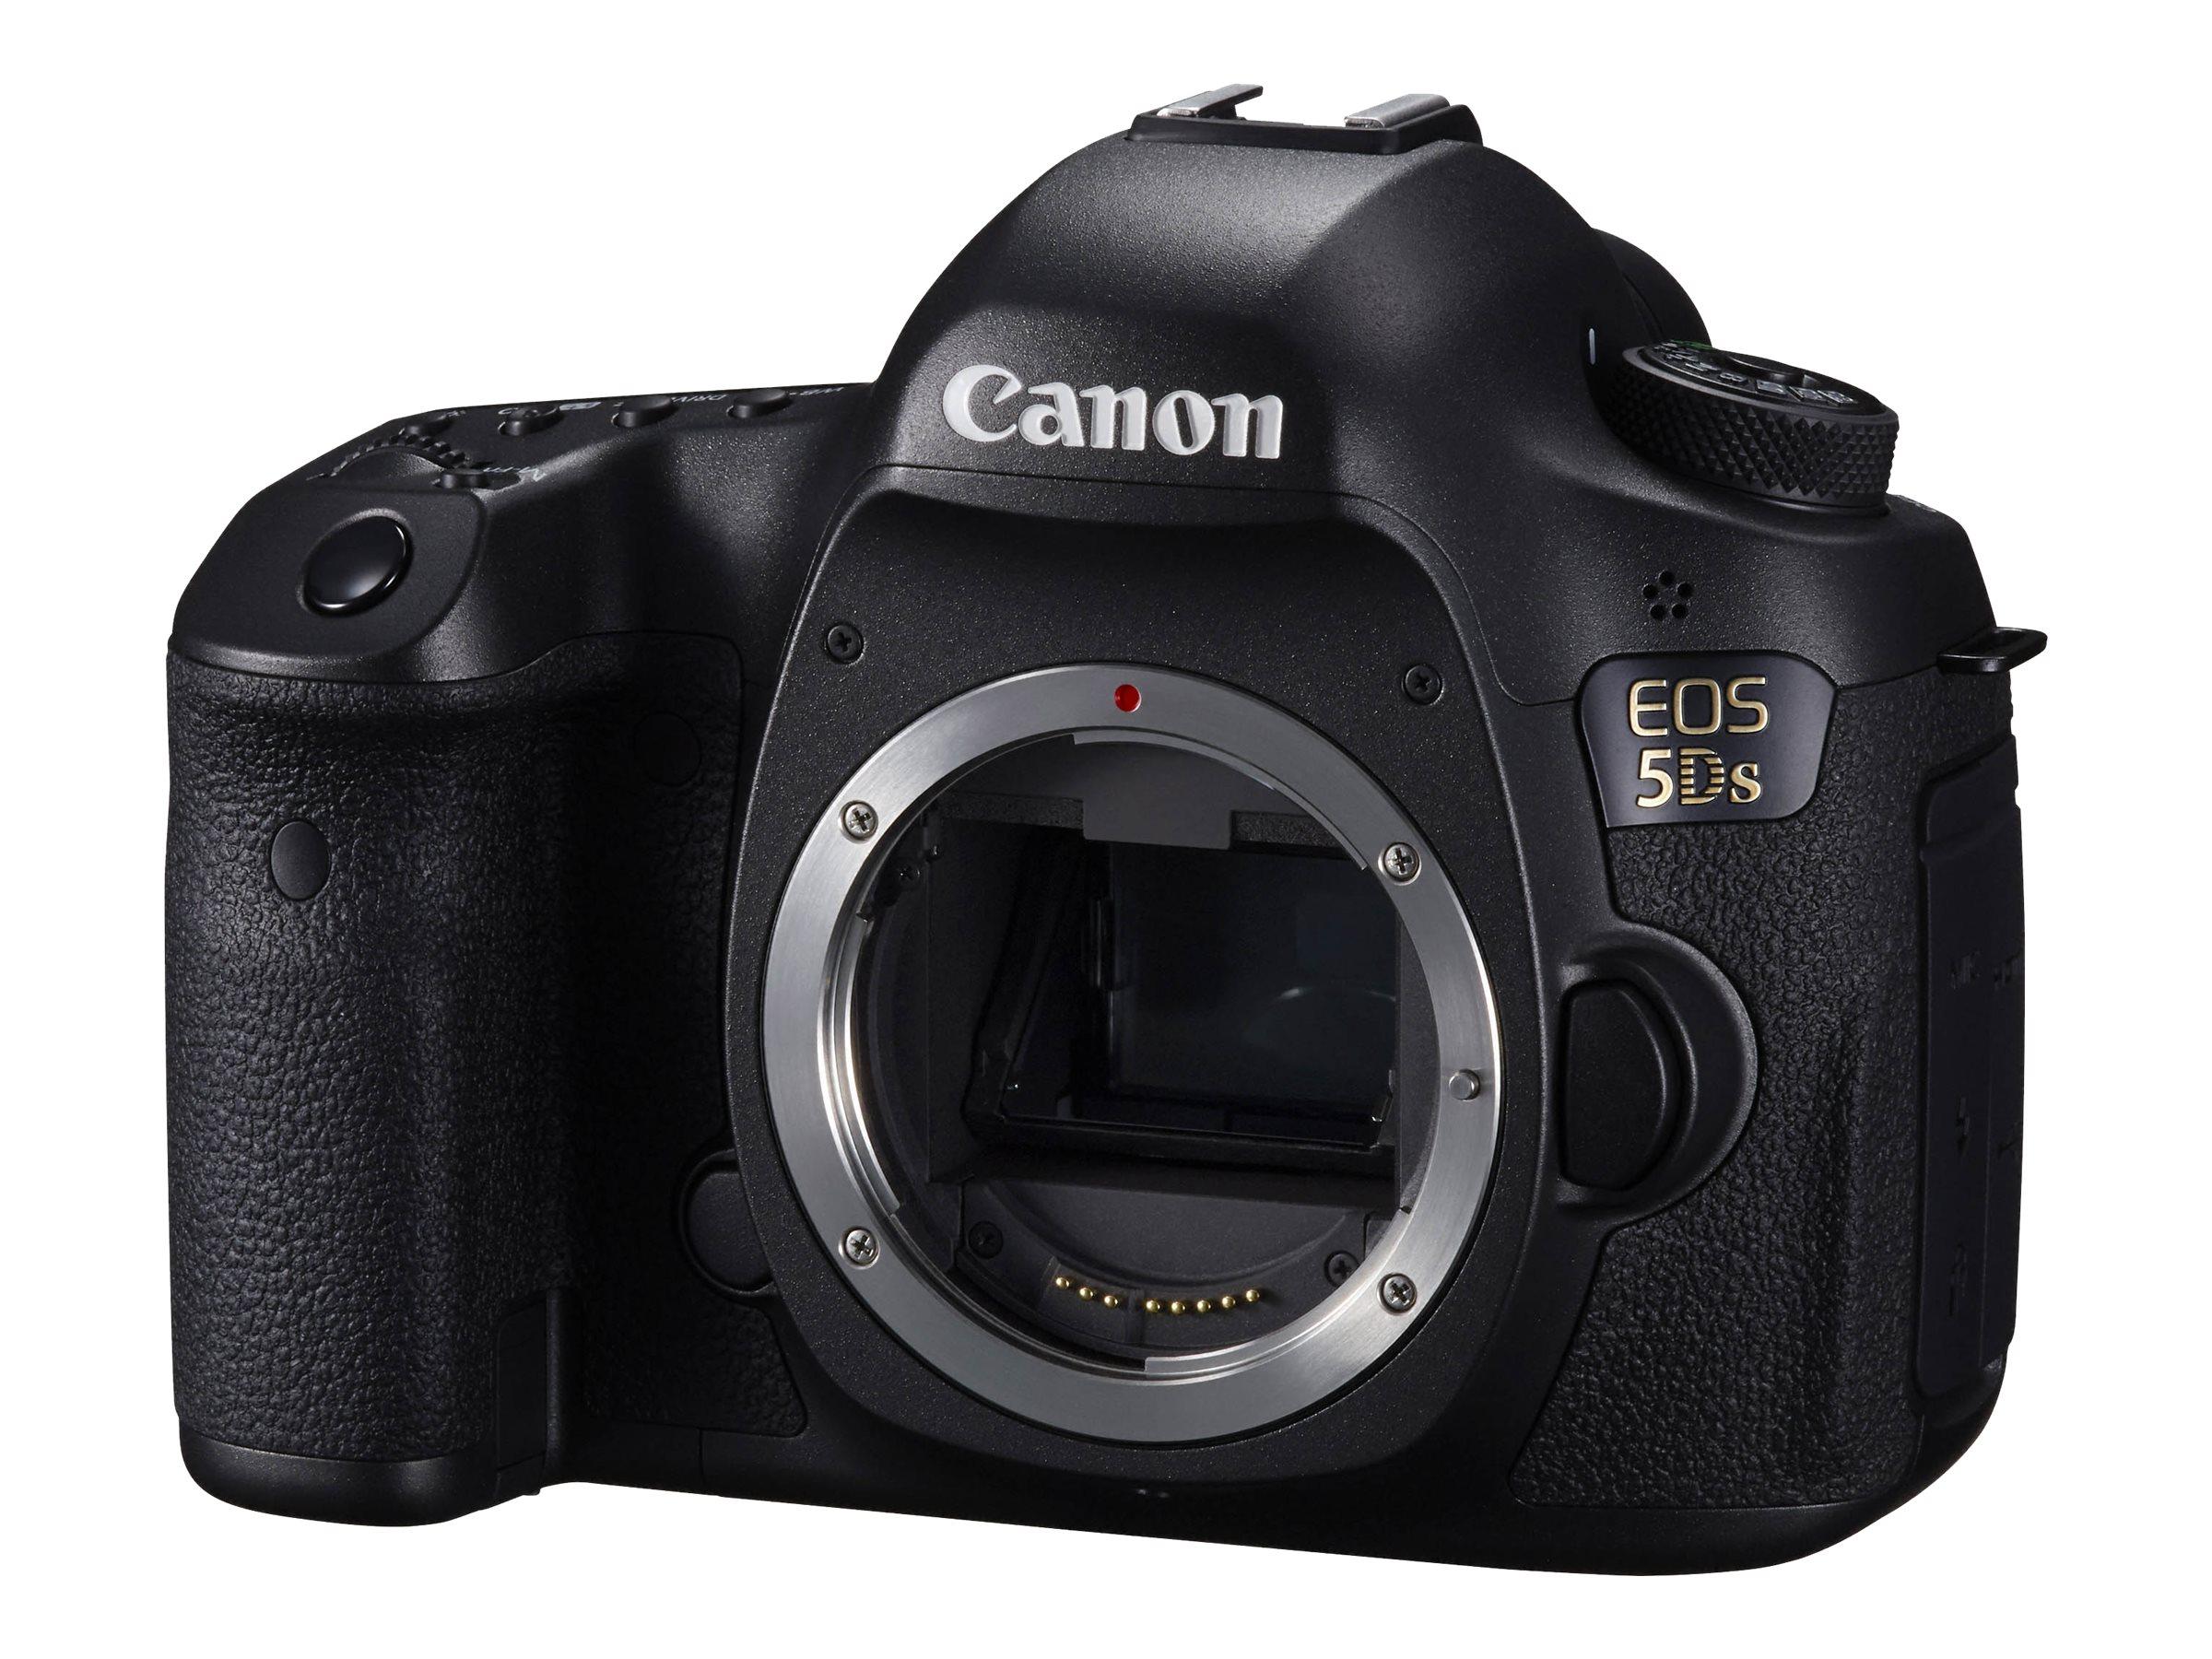 Canon EOS 5DS Camera (Body Only), Black, 0581C002, 18924754, Cameras - Digital